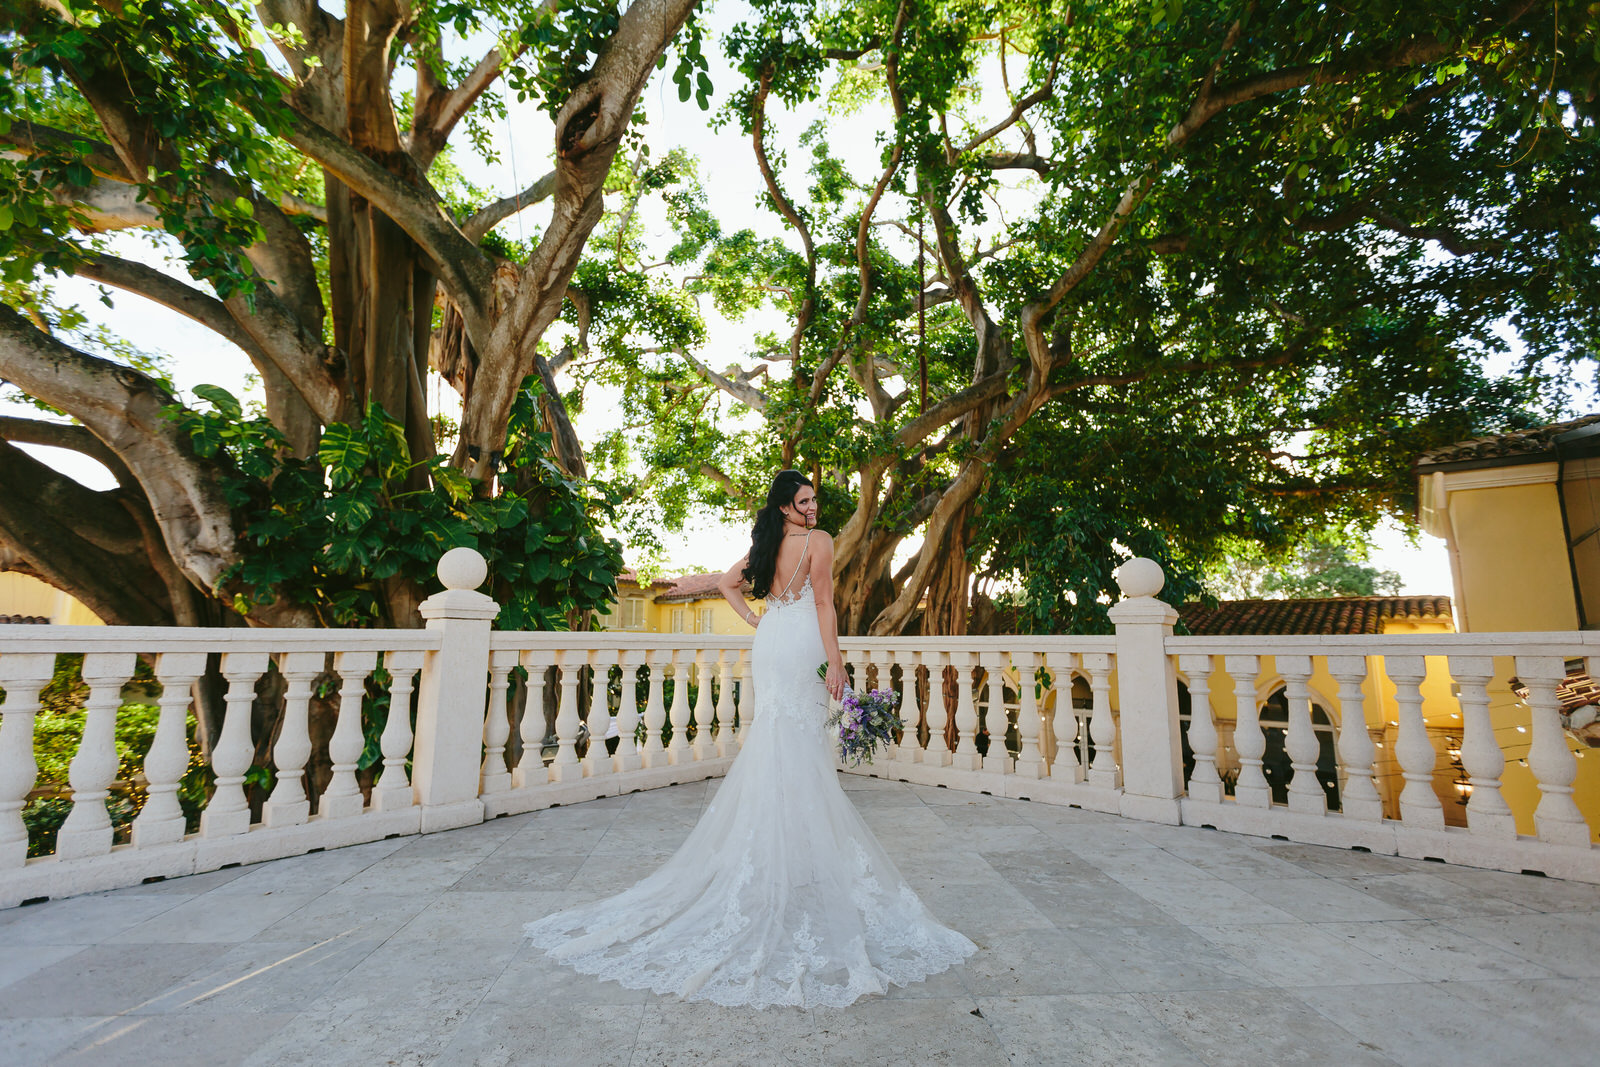 amazing_wedding_photography_tiny_house_photo_south_flroida_destination_documentary.jpg